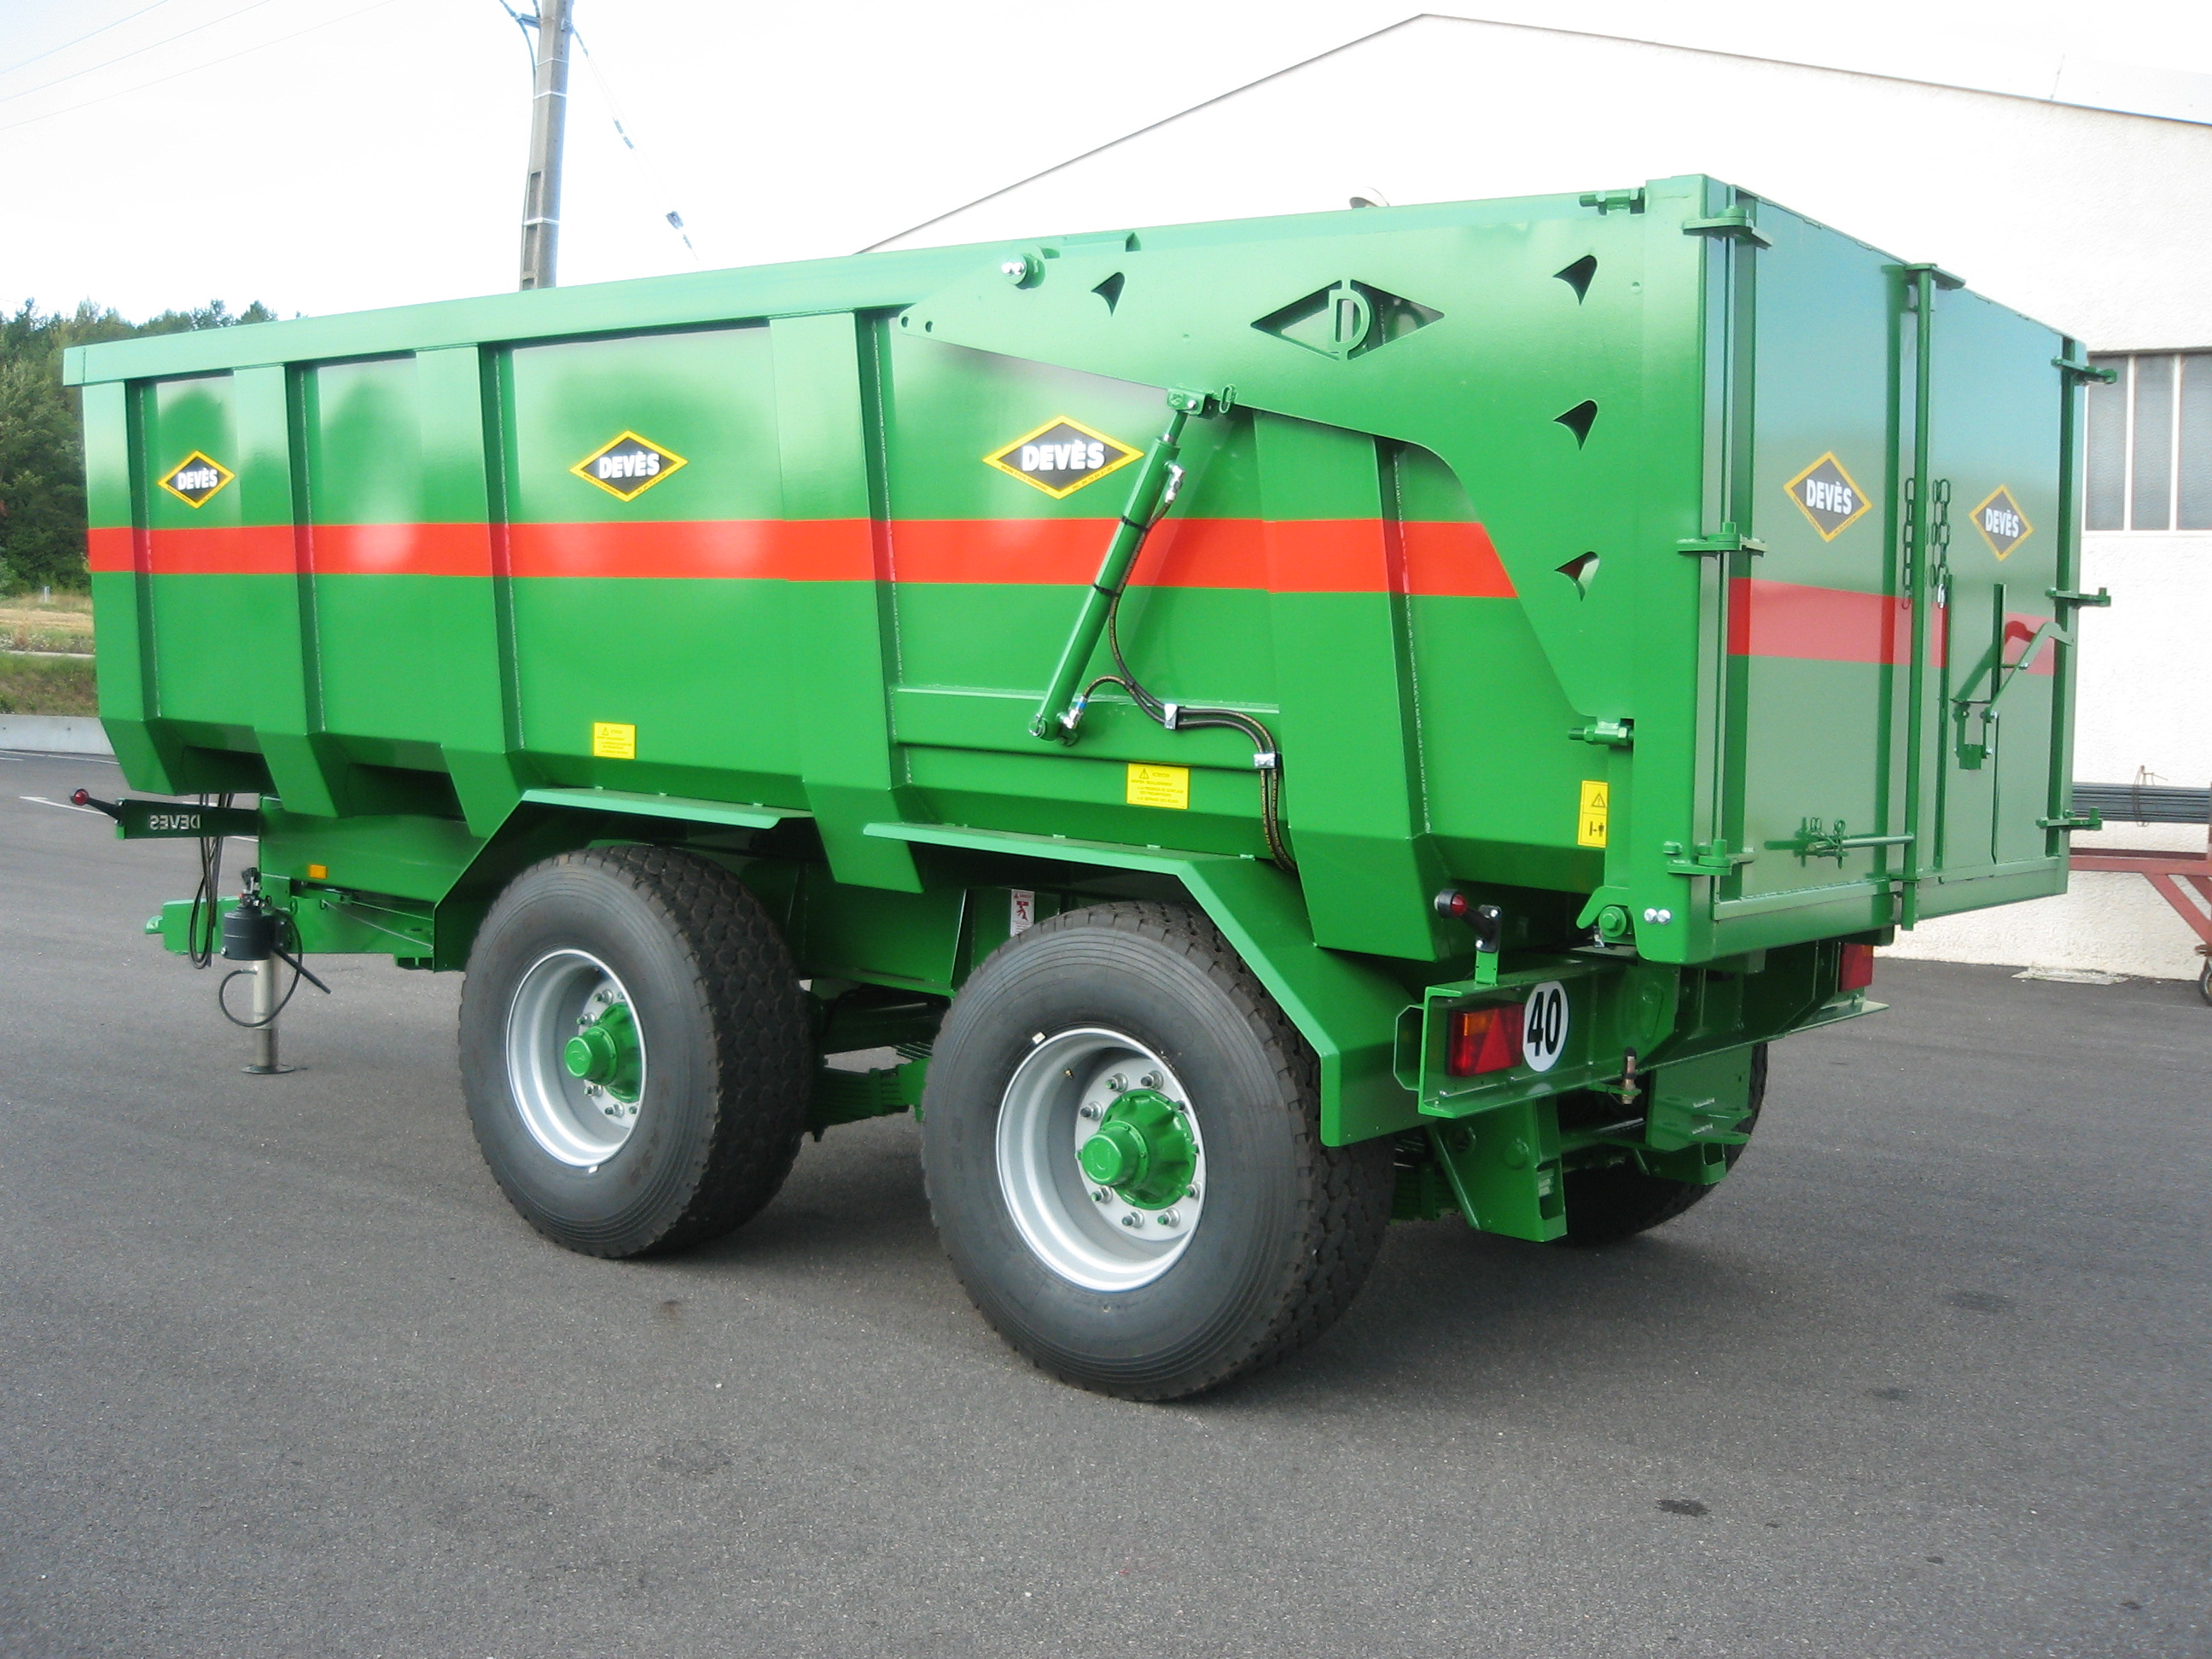 GV 180